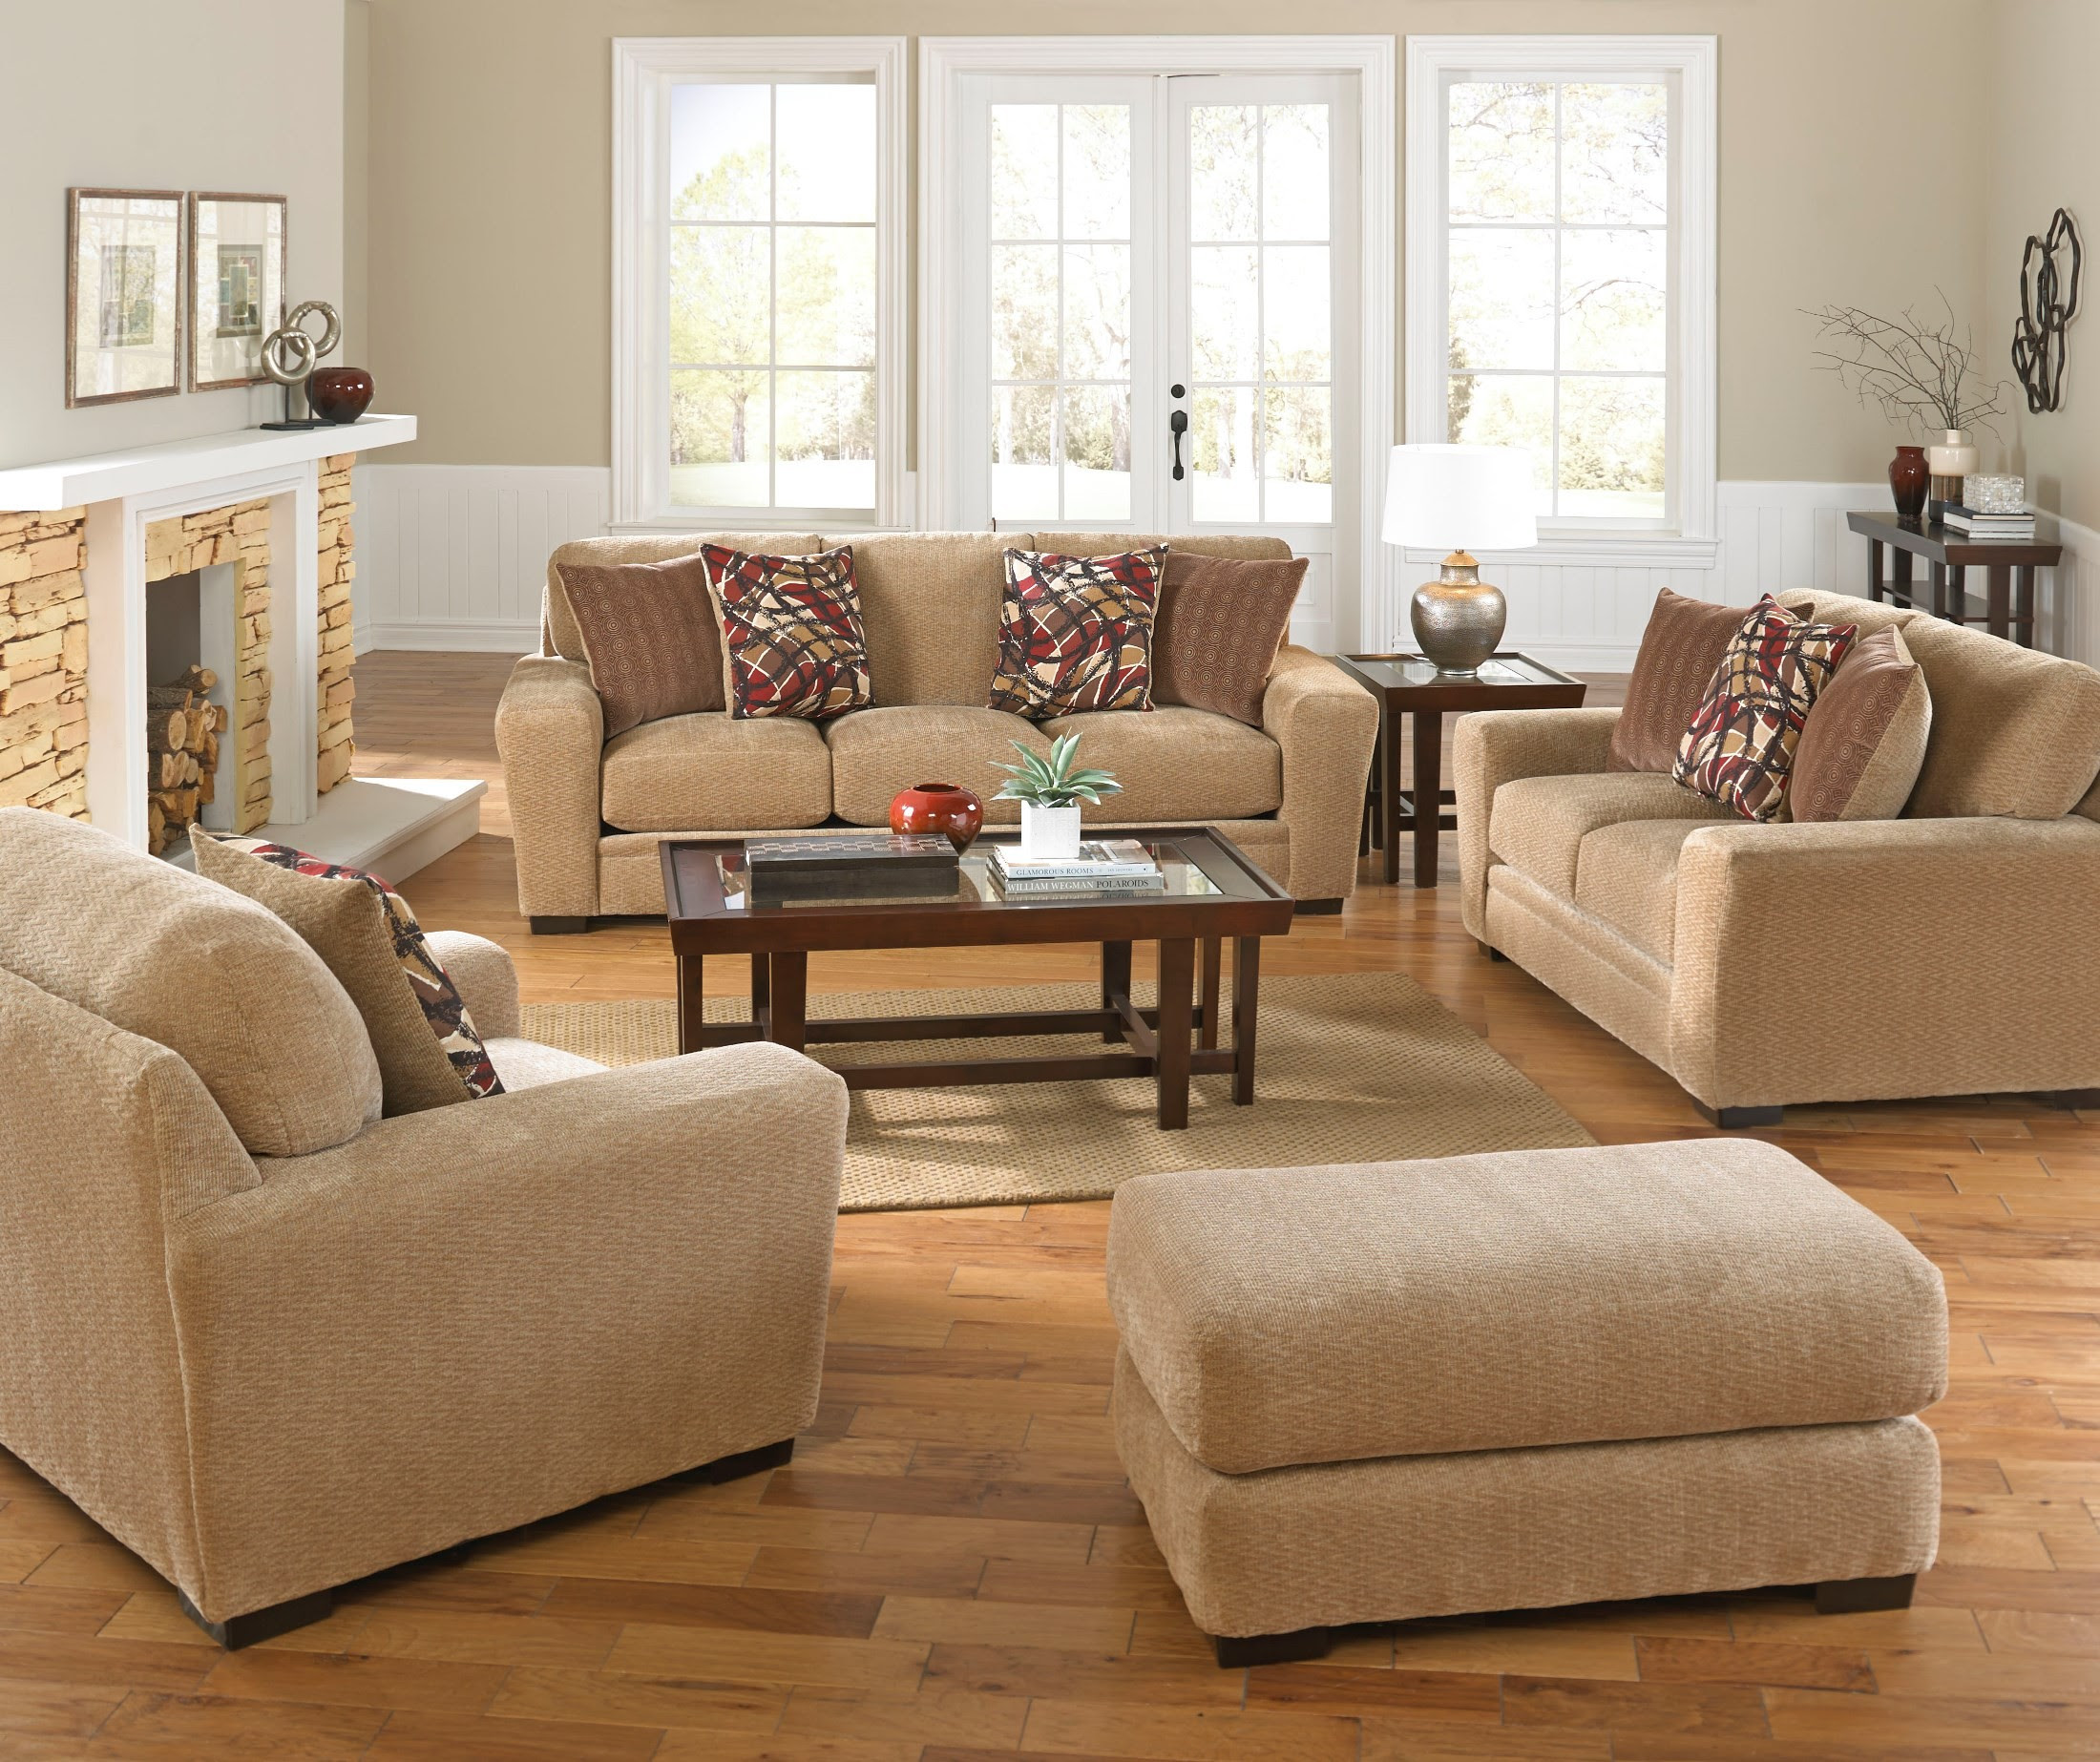 the brick living room furniture